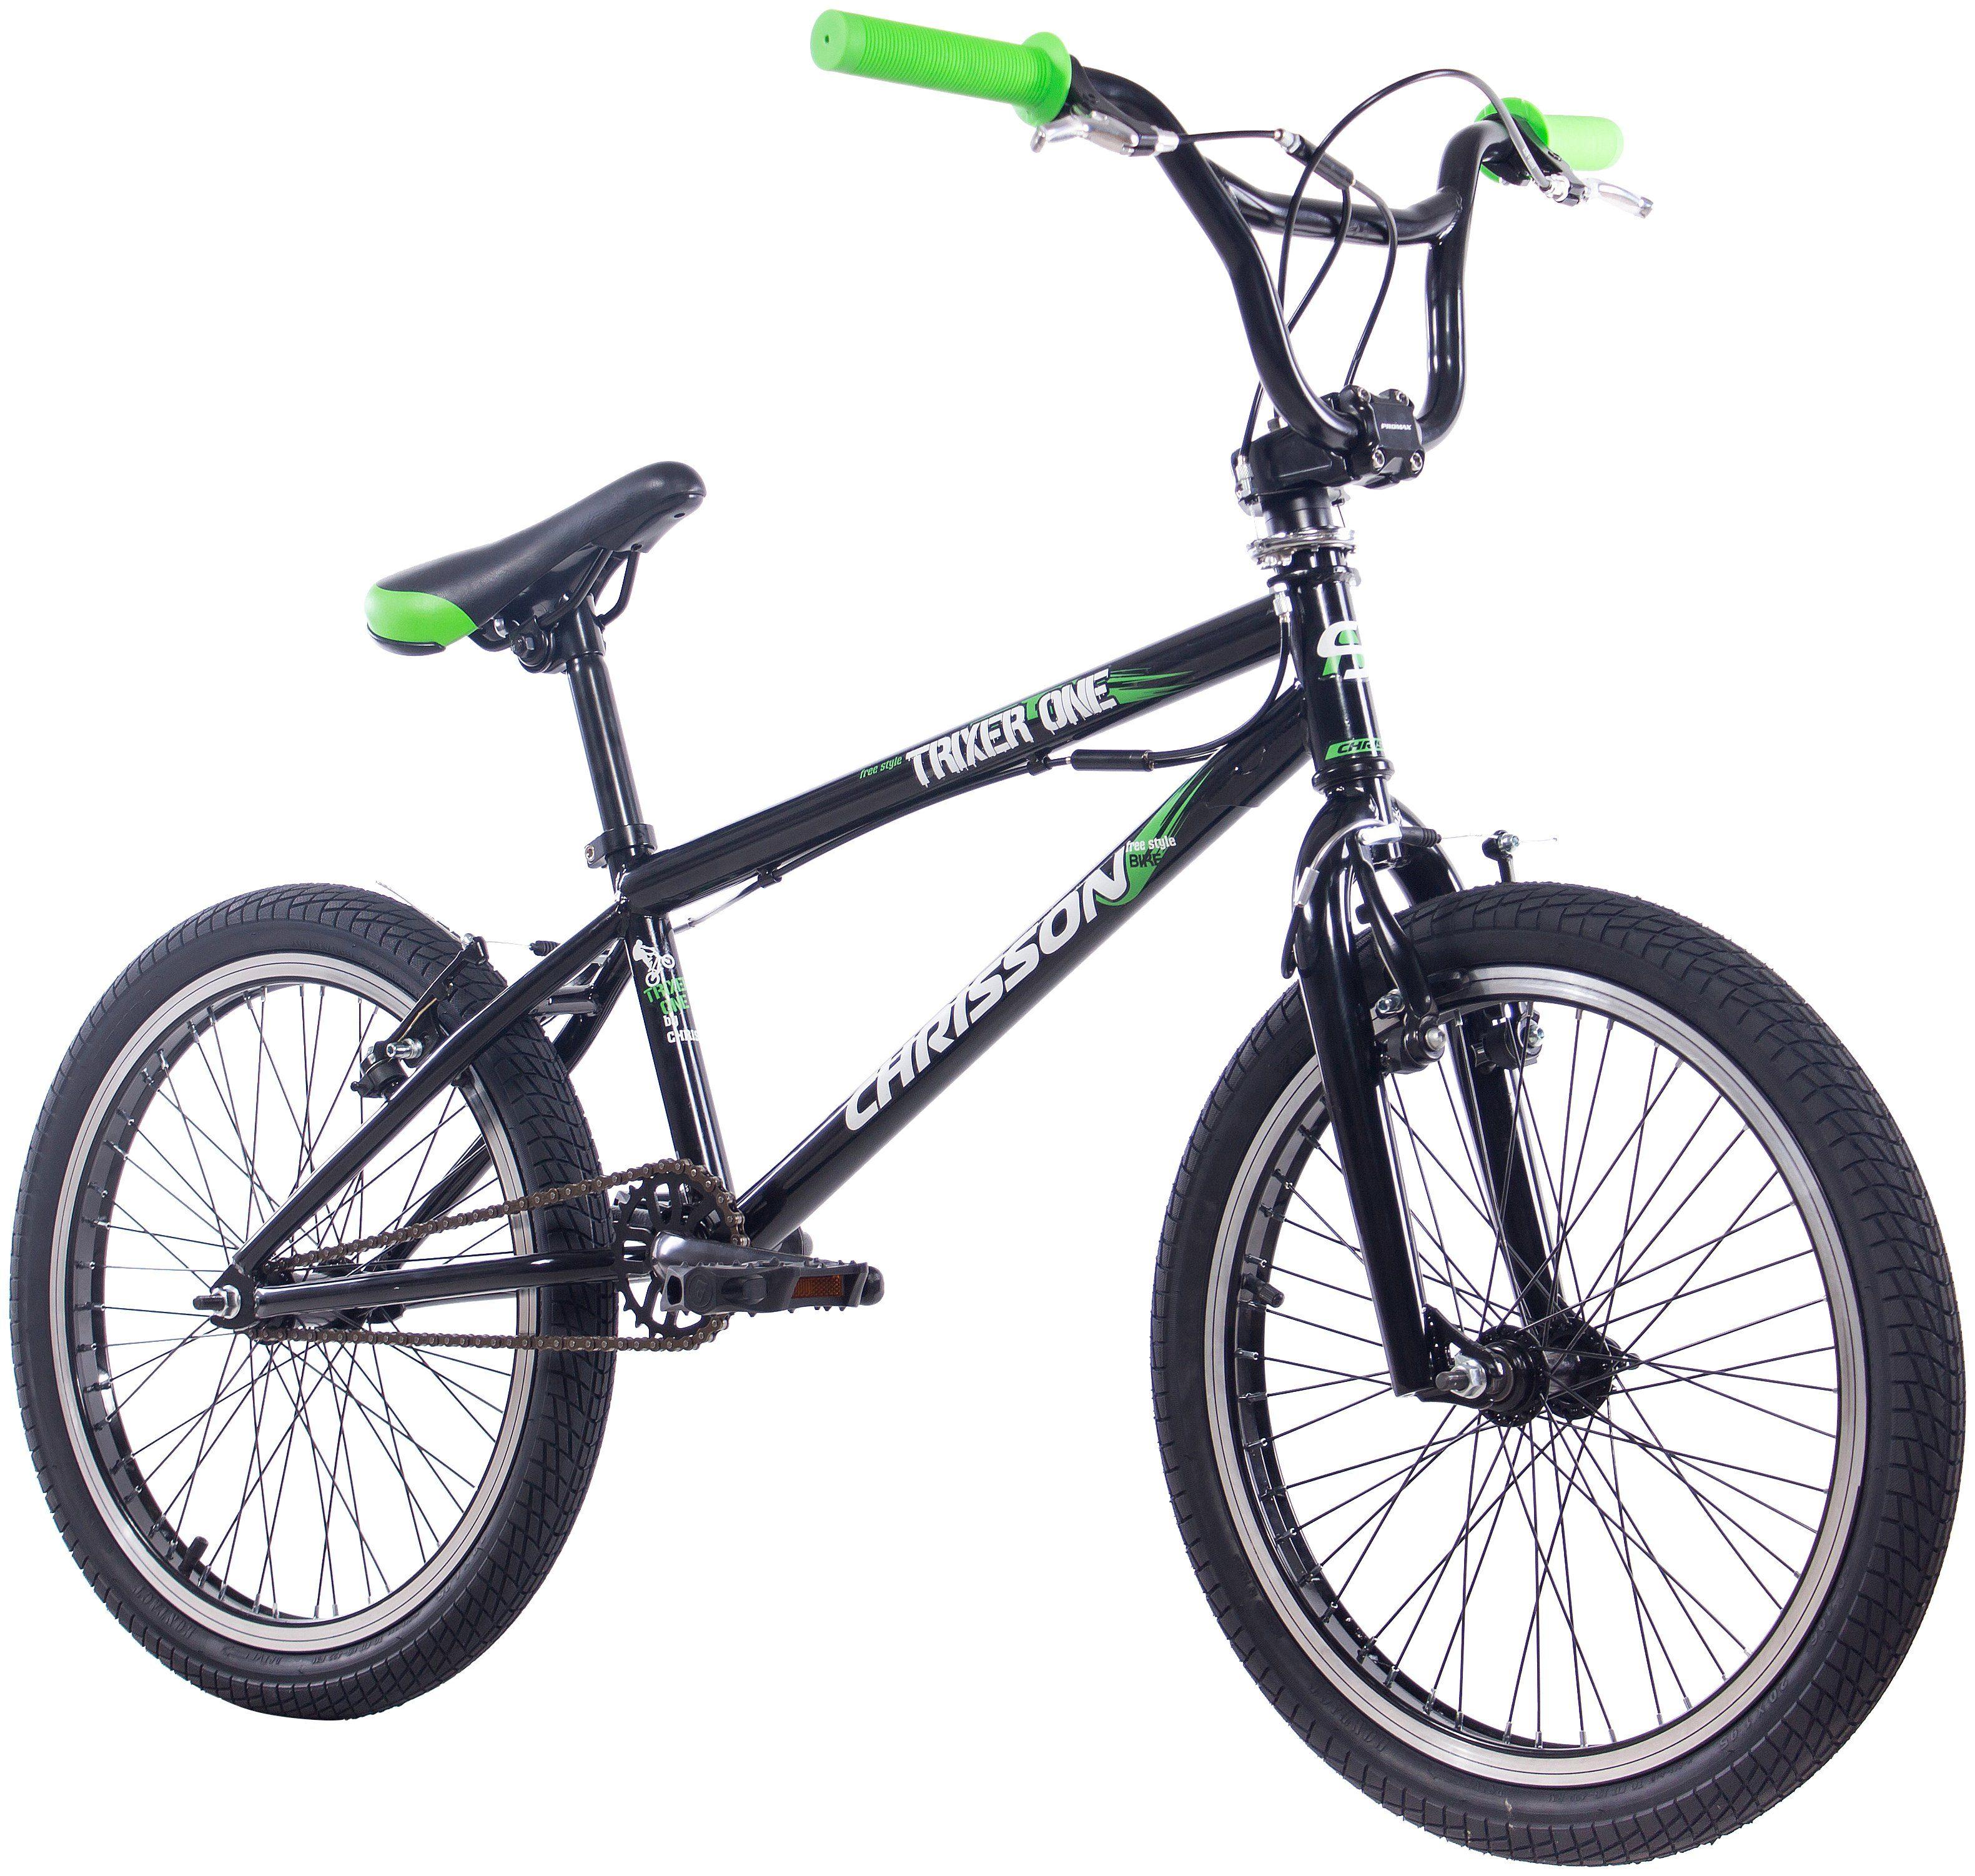 CHRISSON BMX »Trixier One«, 20 Zoll, 1 Gang, V-Bremsen